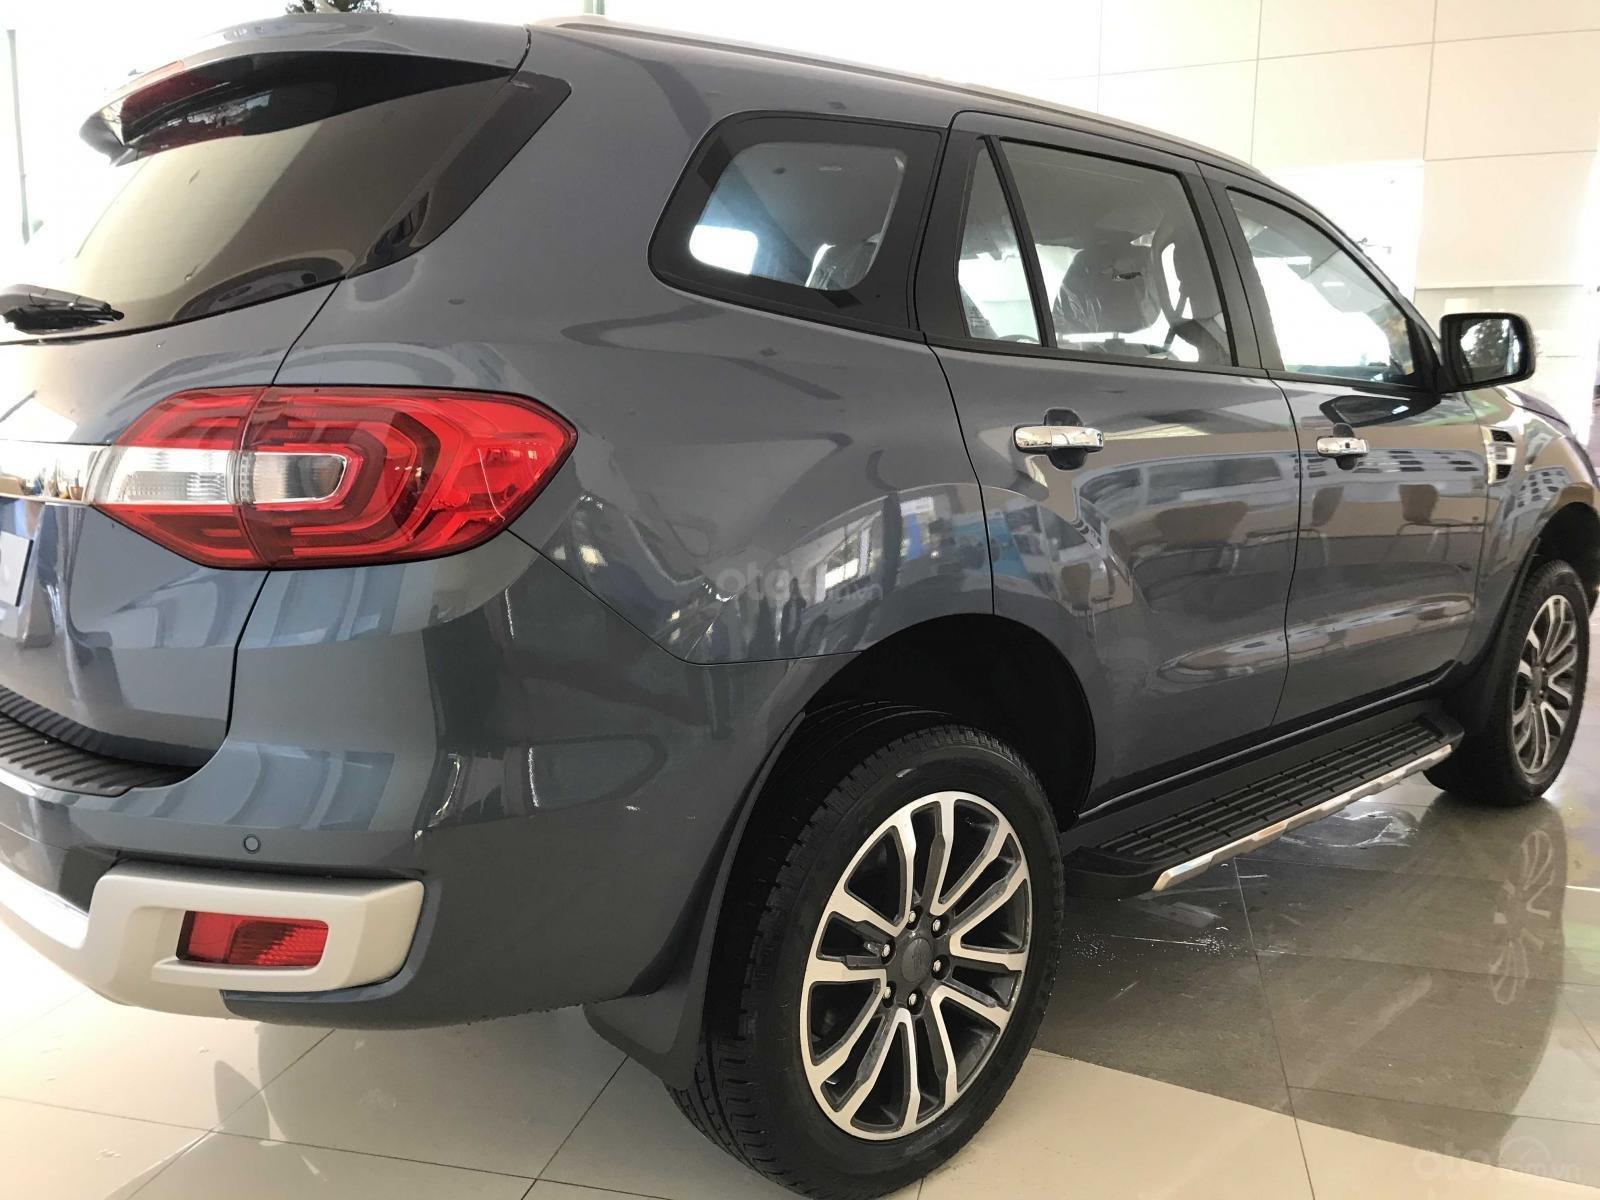 Ford Everest Titanium 2019 nhập khẩu giá tốt nhất (2)